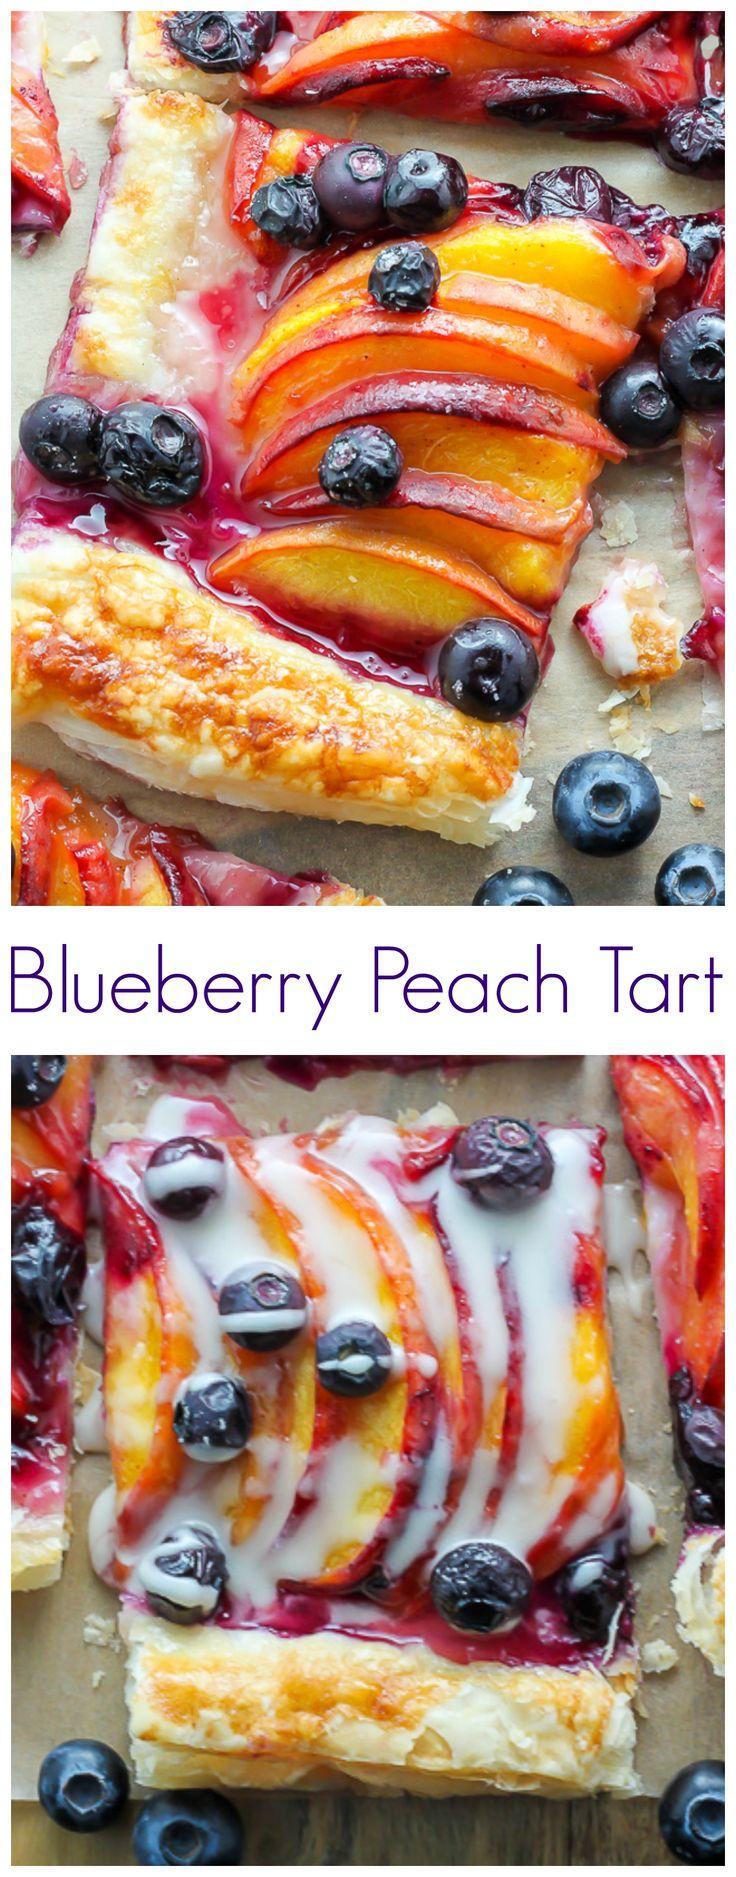 Easy Blueberry Peach Tart with Vanilla Glaze - SUMMER in a slice!